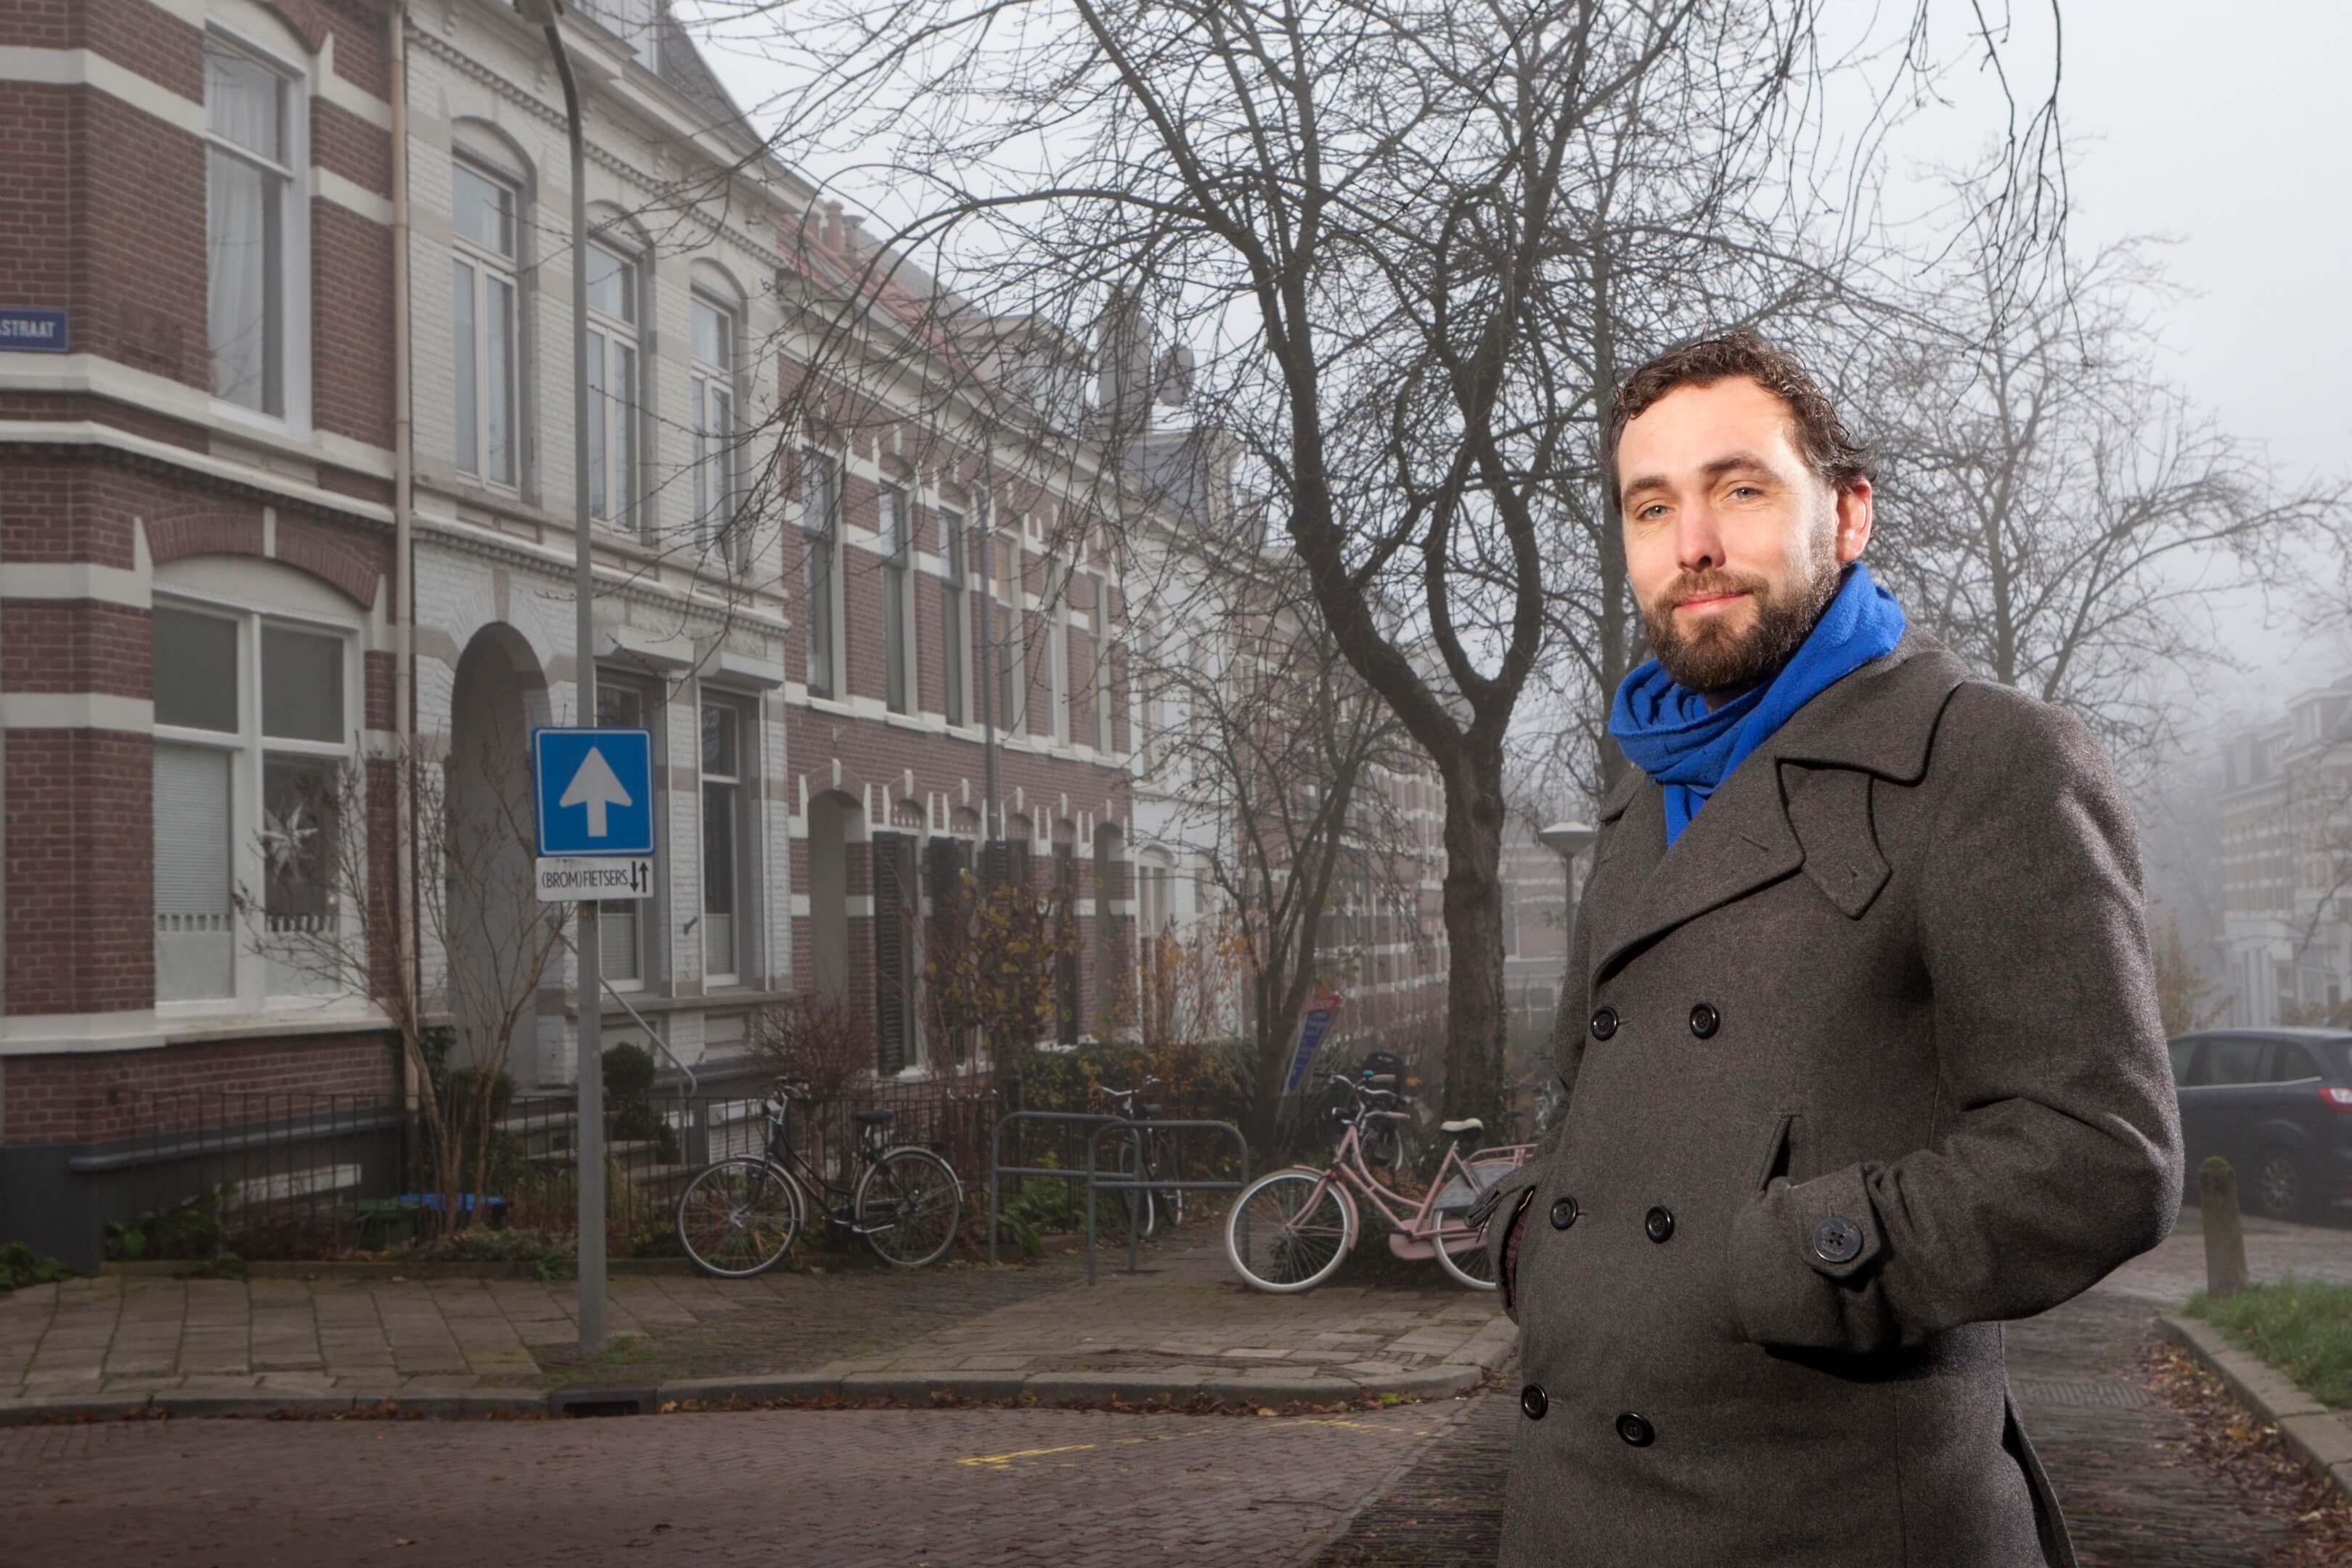 Gemeente Arnhem Jurjen Poeles fotografie project fotografie Vastgoedplein Nijhoffstraat portret sint Marten omgevingsportret Staringplein